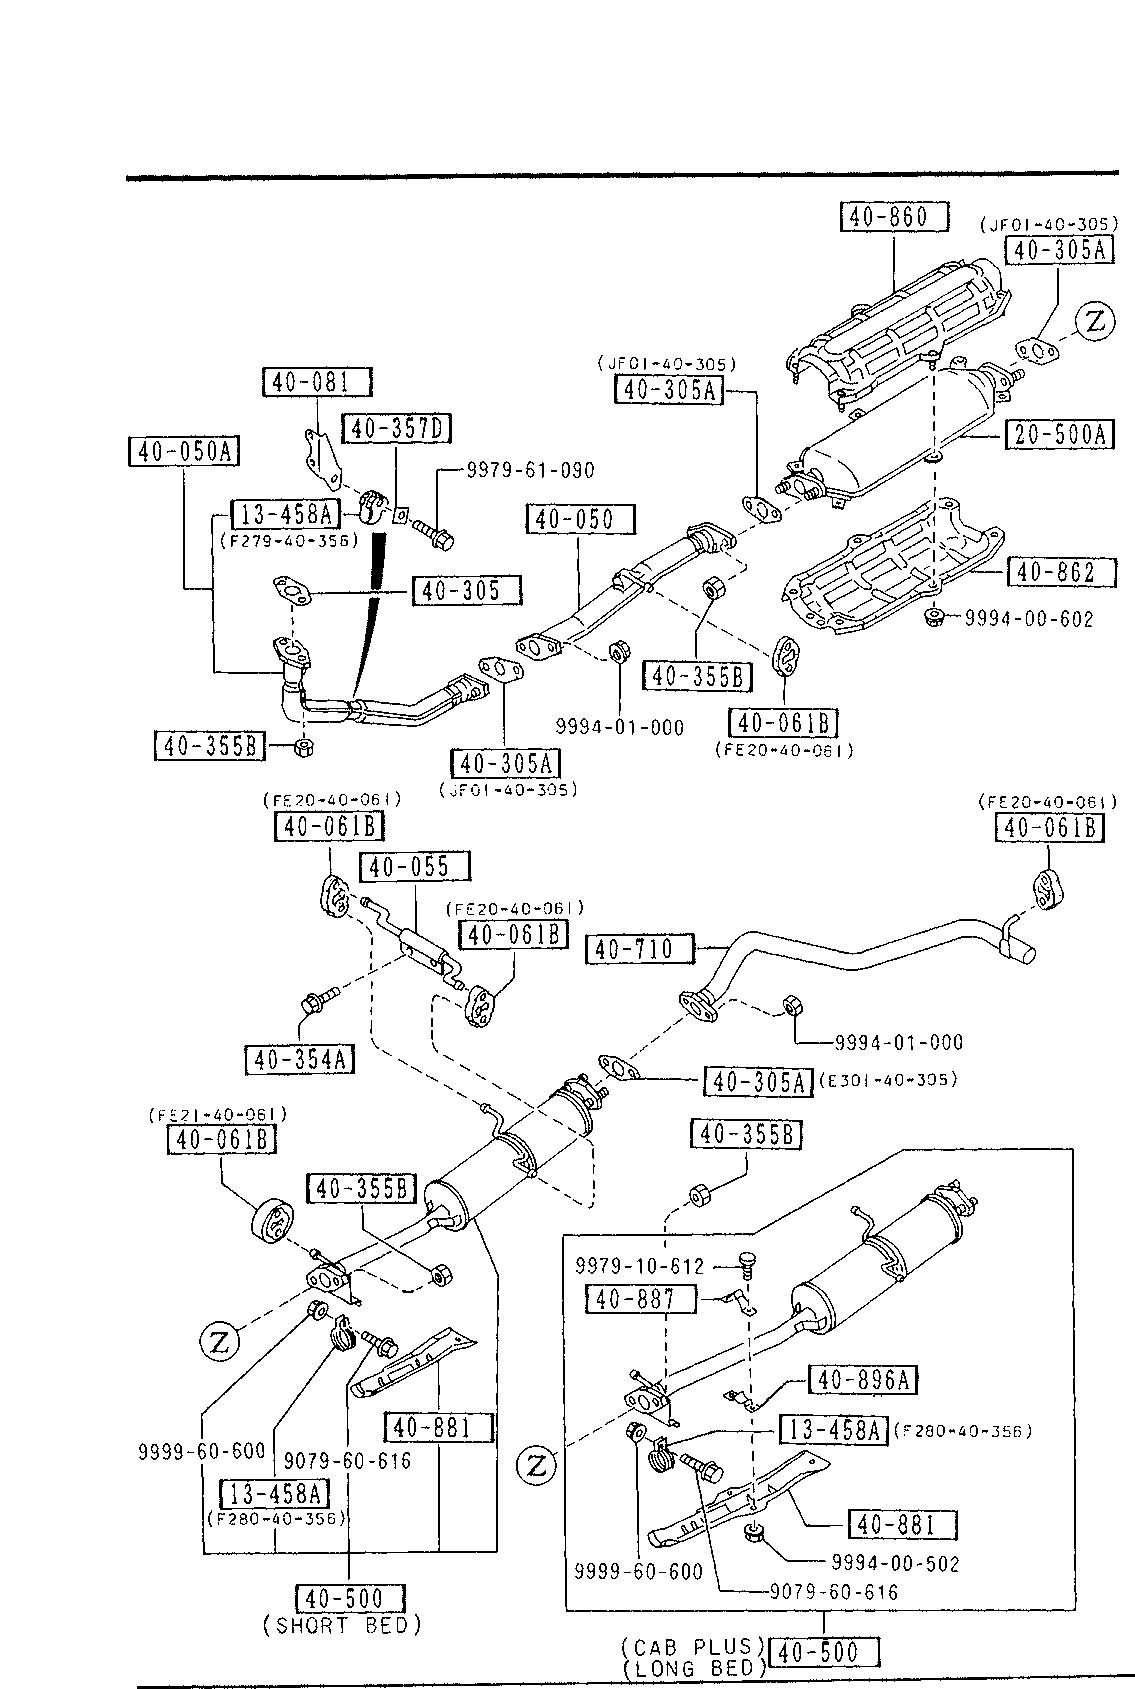 [DIAGRAM_4PO]  USA, 1991 B2200, GASOLINE-ENGINE SUPPLEMENT, 4000 A - EXHAUST SYSTEM  (2200CC)(EGI) - Catcar.info | Mazda B2200 Engine Exhaust Diagram |  | CATCAR.INFO